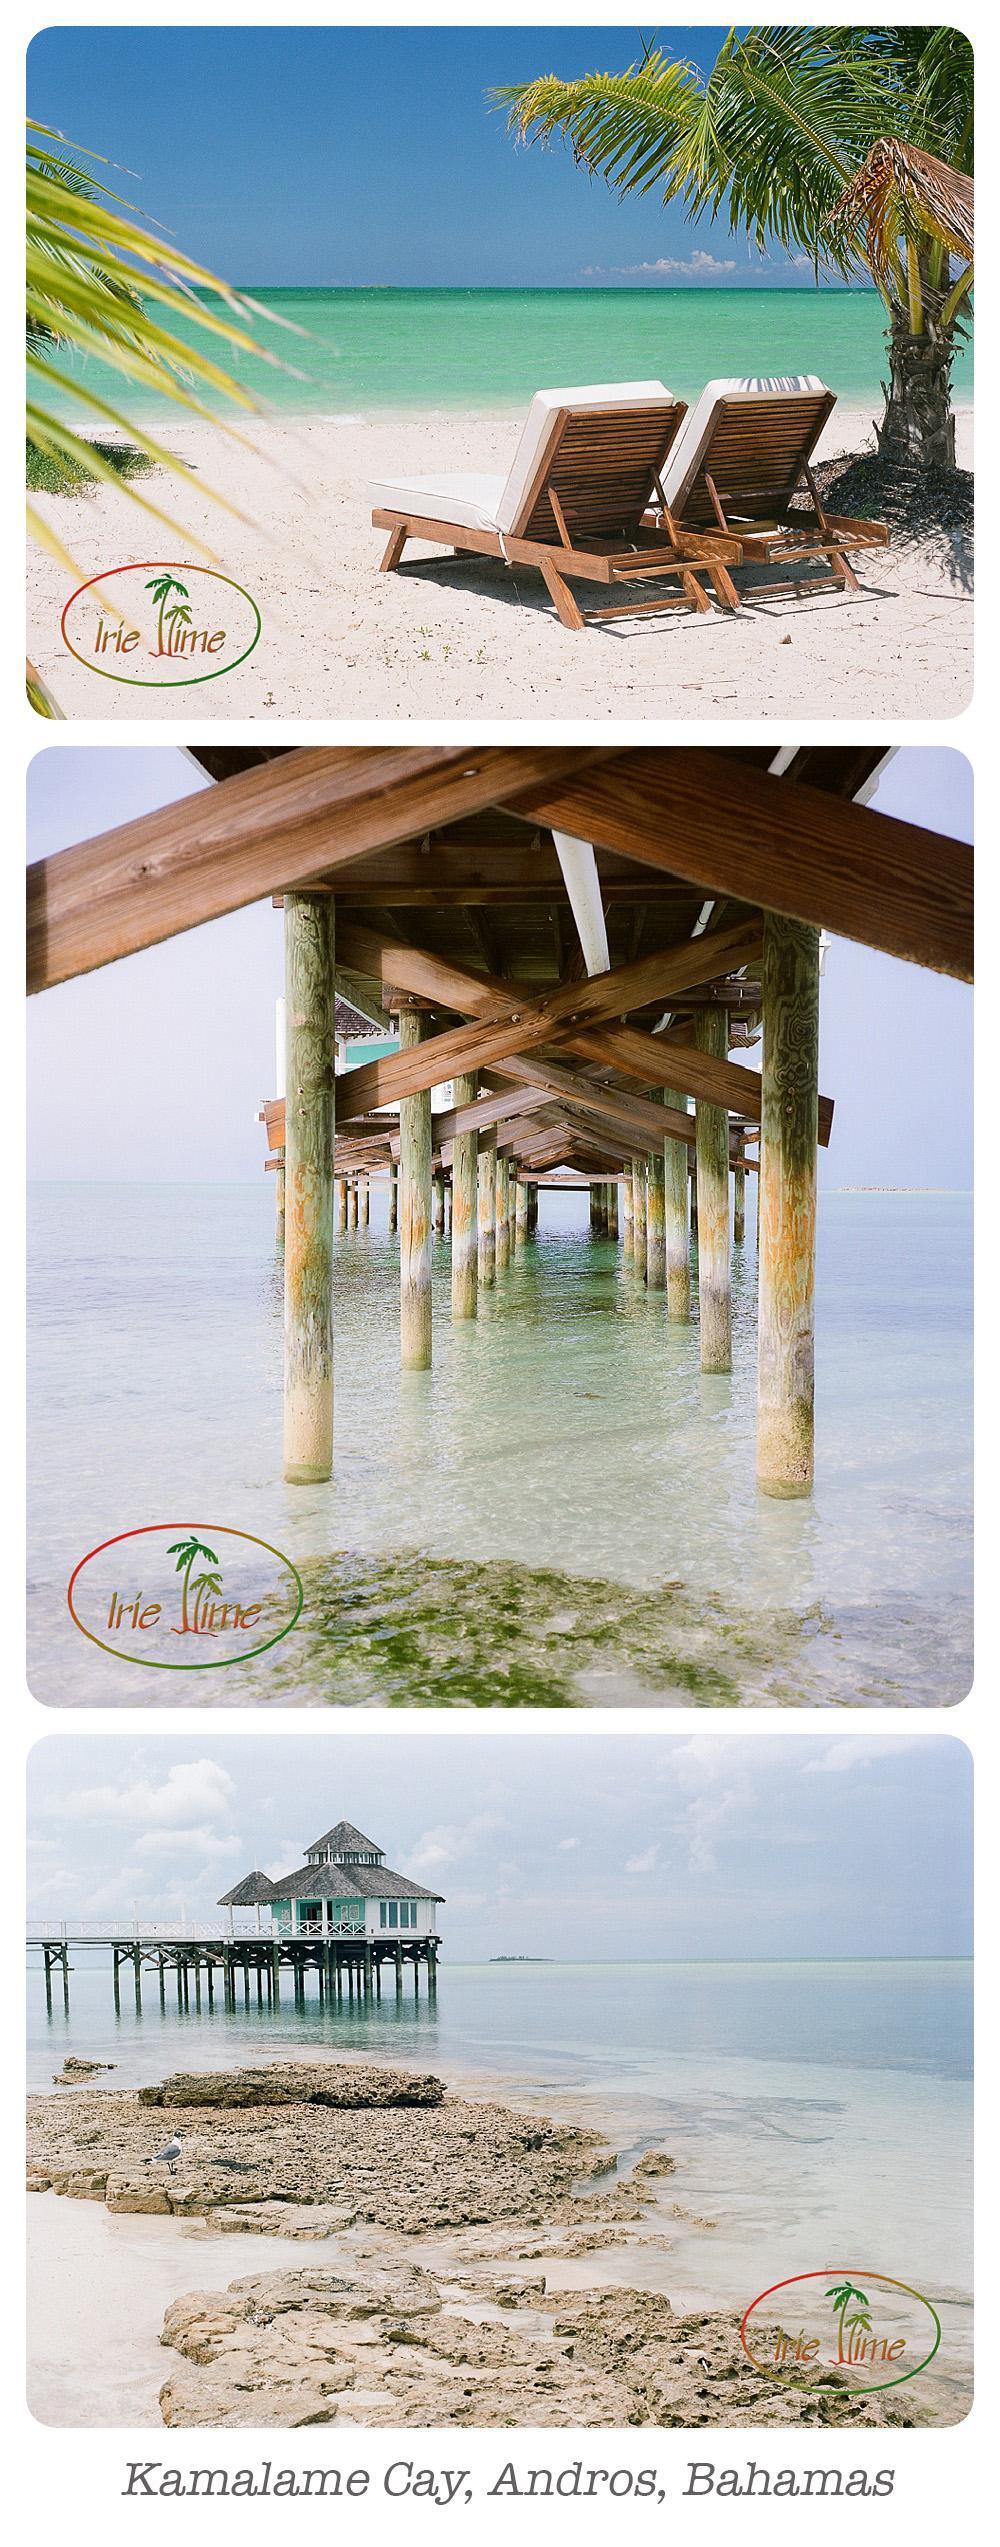 Kamalame Cay, Andros, Bahamas